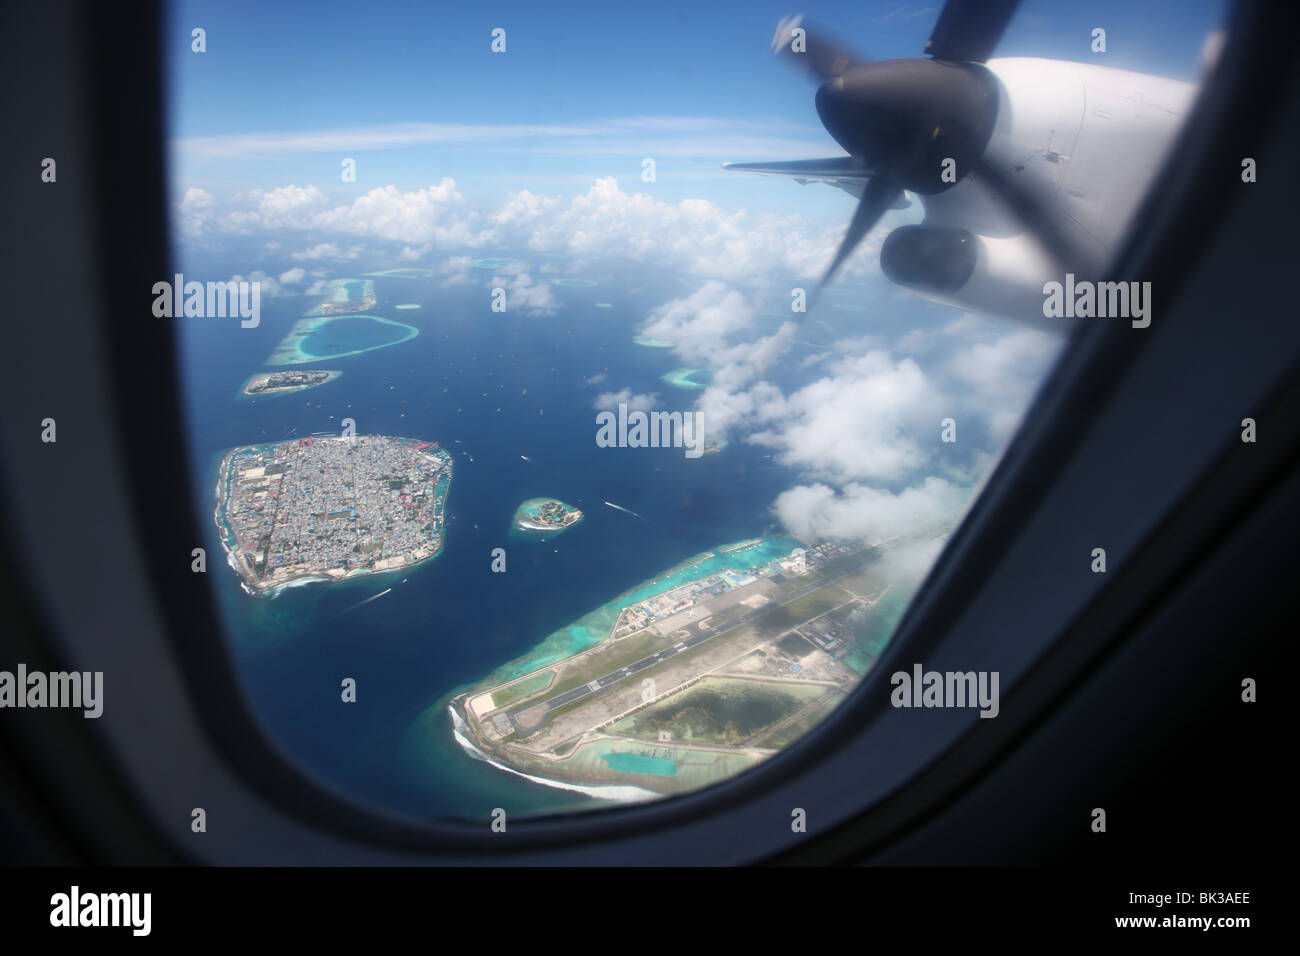 Aeroporto Male Maldive : Maldives male aerial view from an airplane at male international